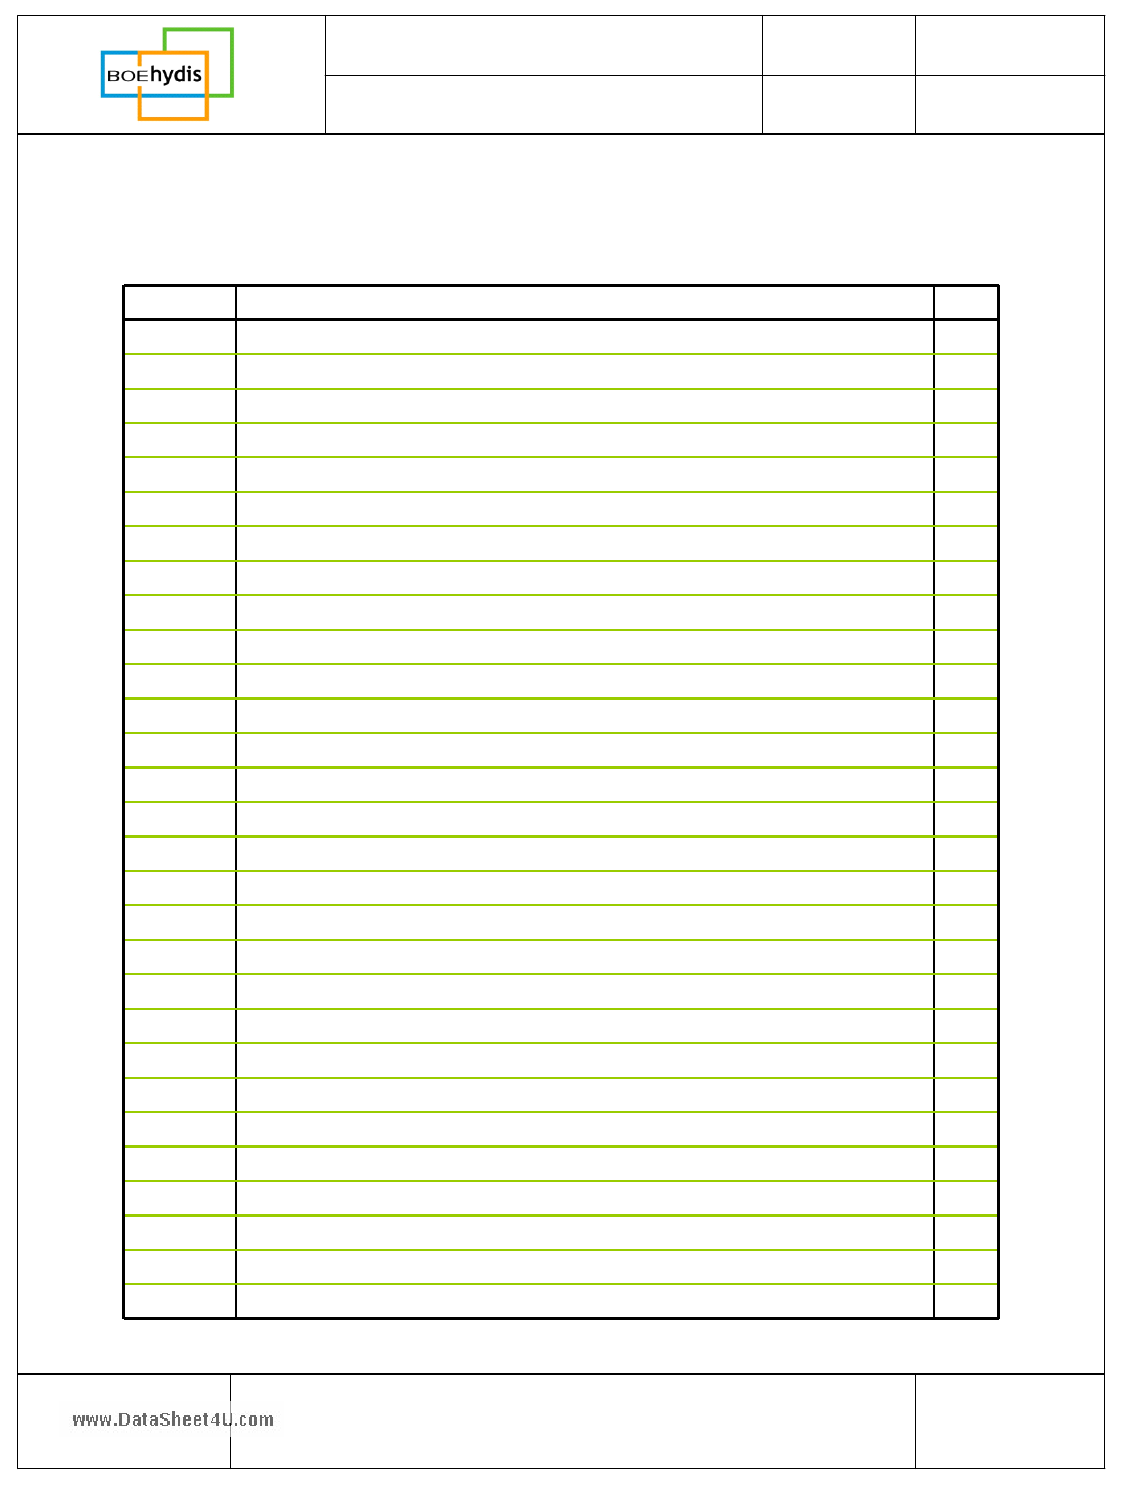 HV056WX1-100 pdf, ピン配列